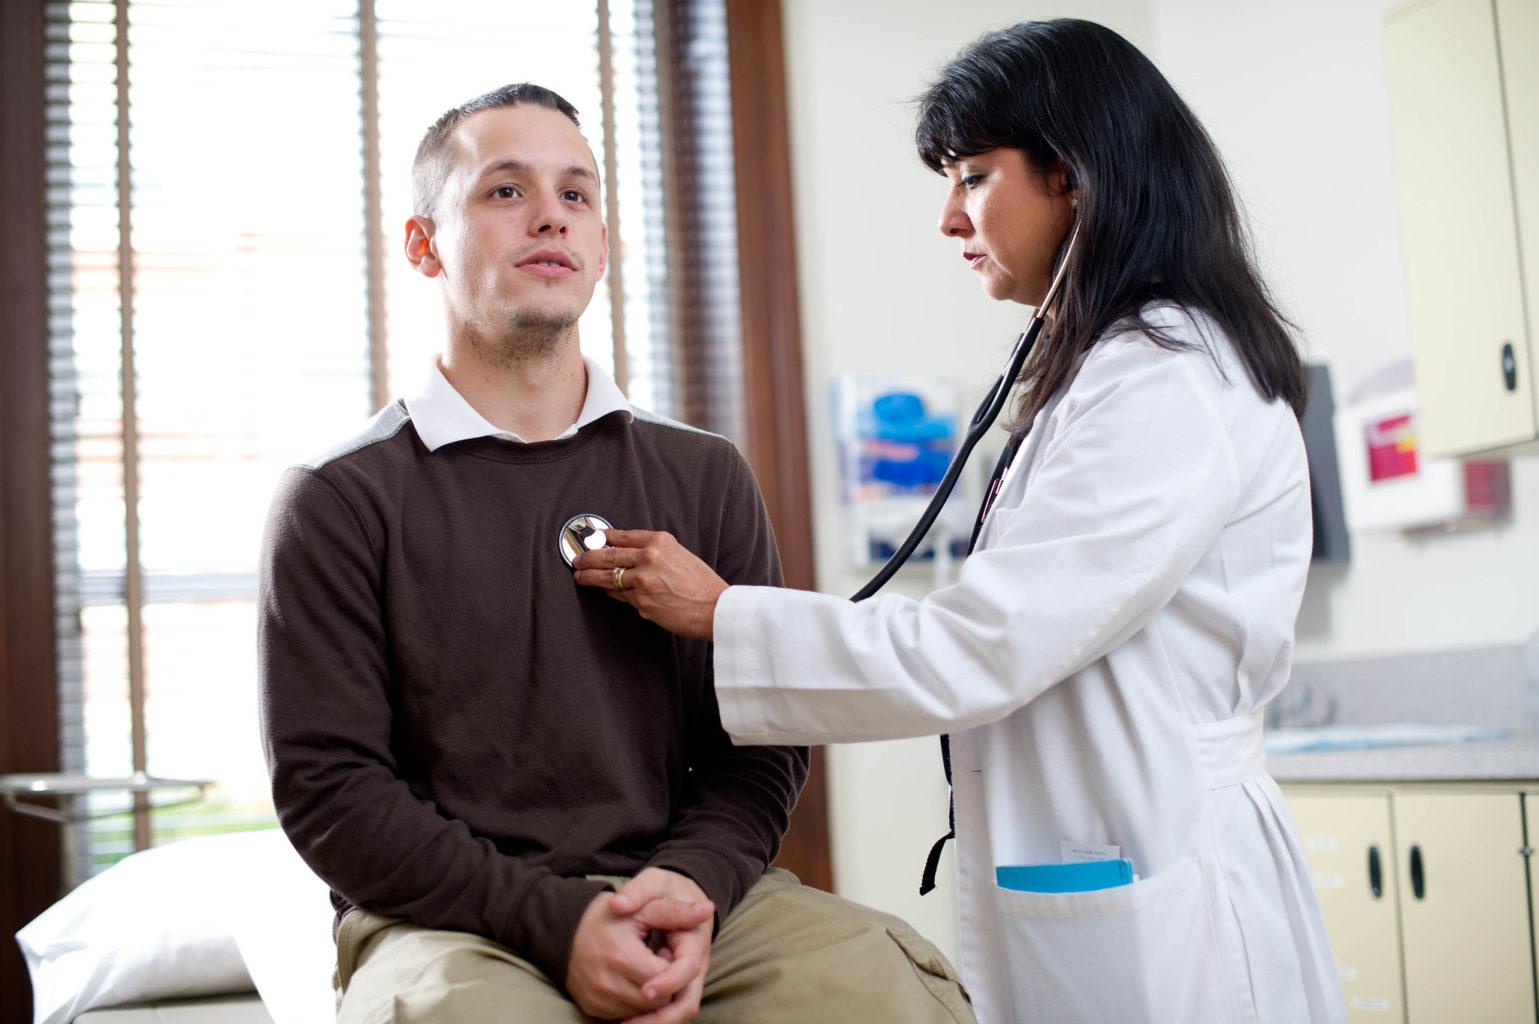 Nurse listening to male patient's heart.